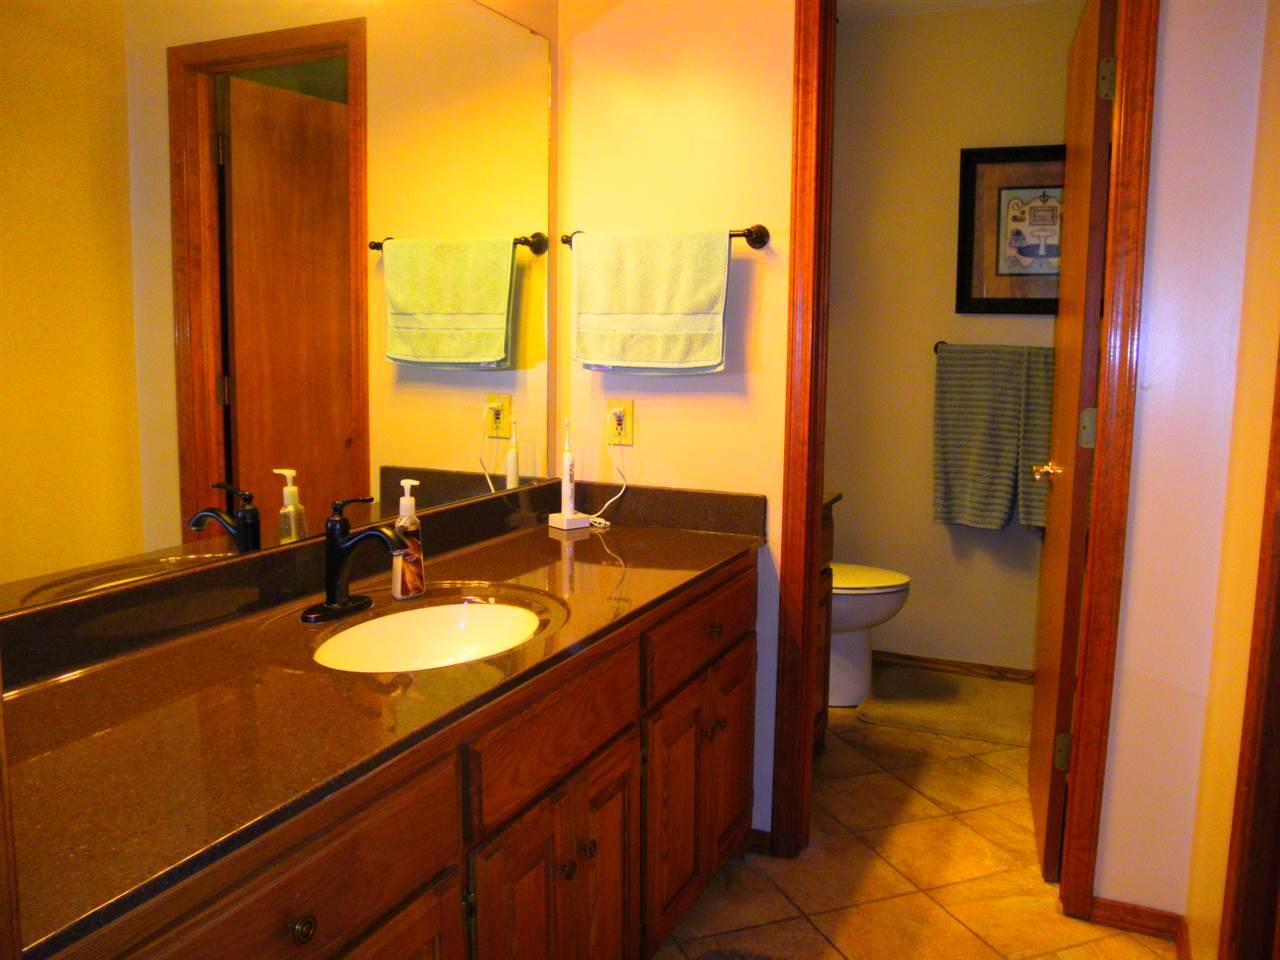 Sold Cross Sale W/ MLS | 32 Raintree Ponca City, OK 74604 17